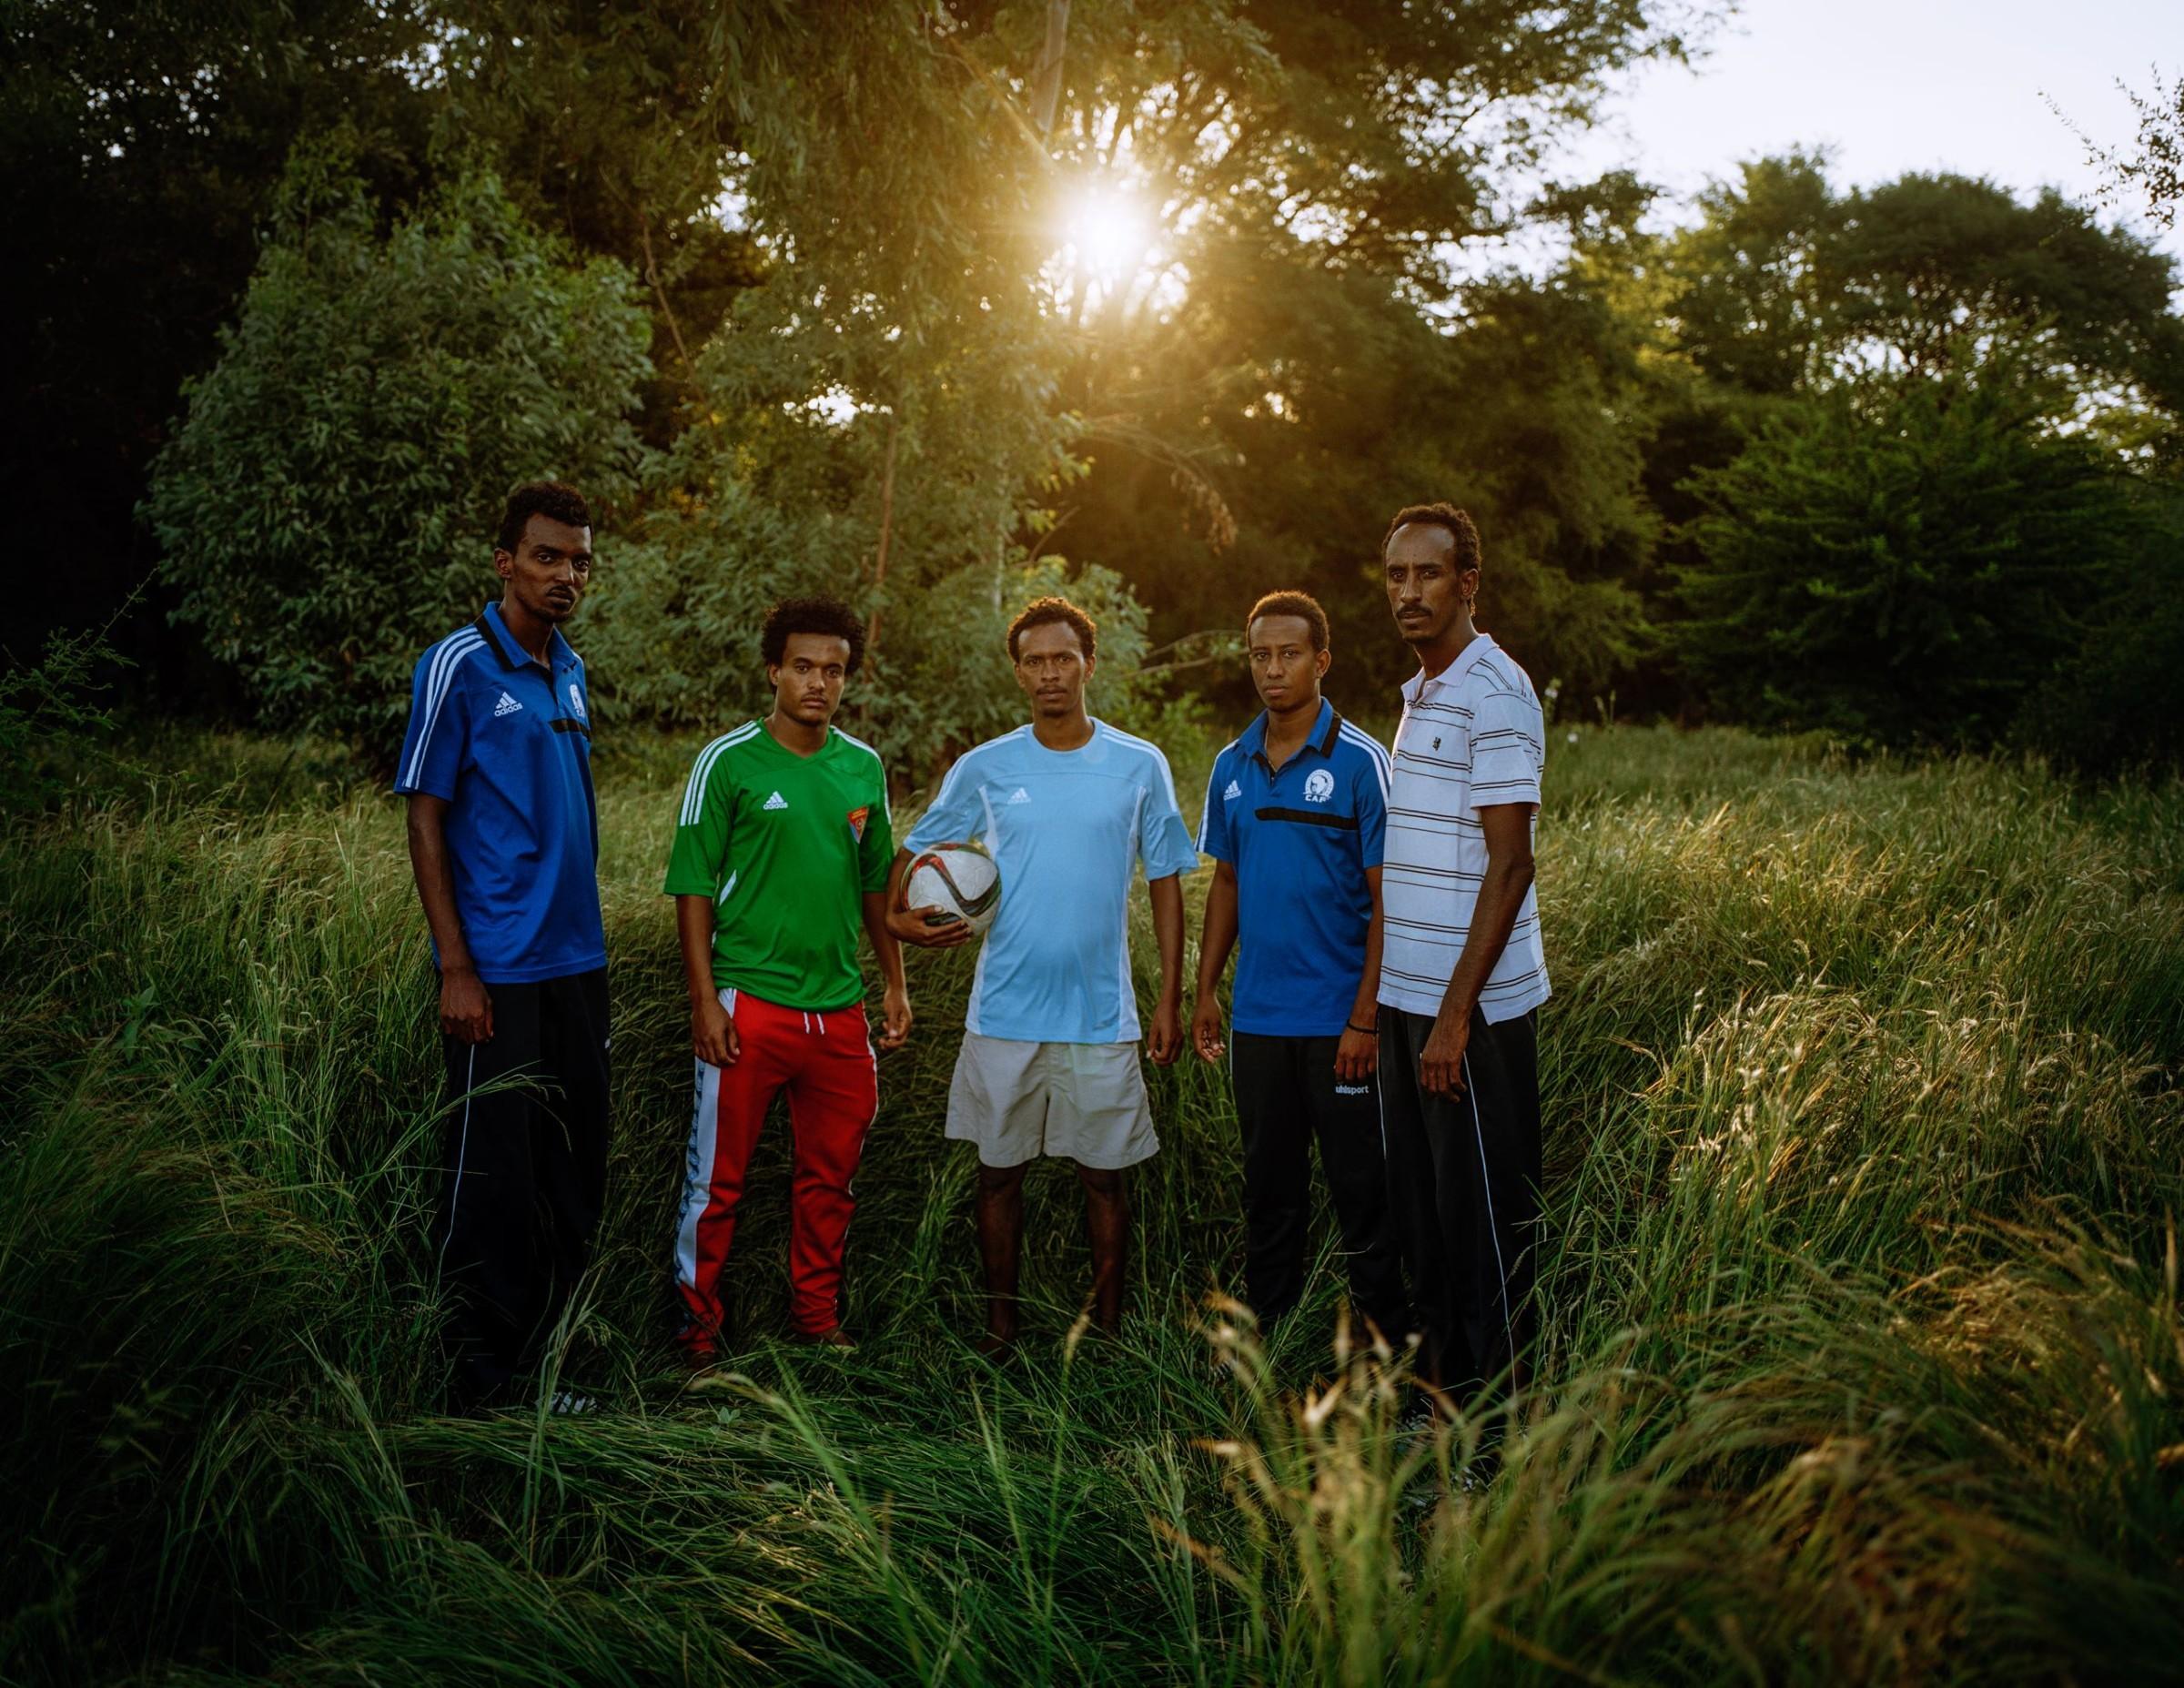 The Soccer-Star Refugees of Eritrea